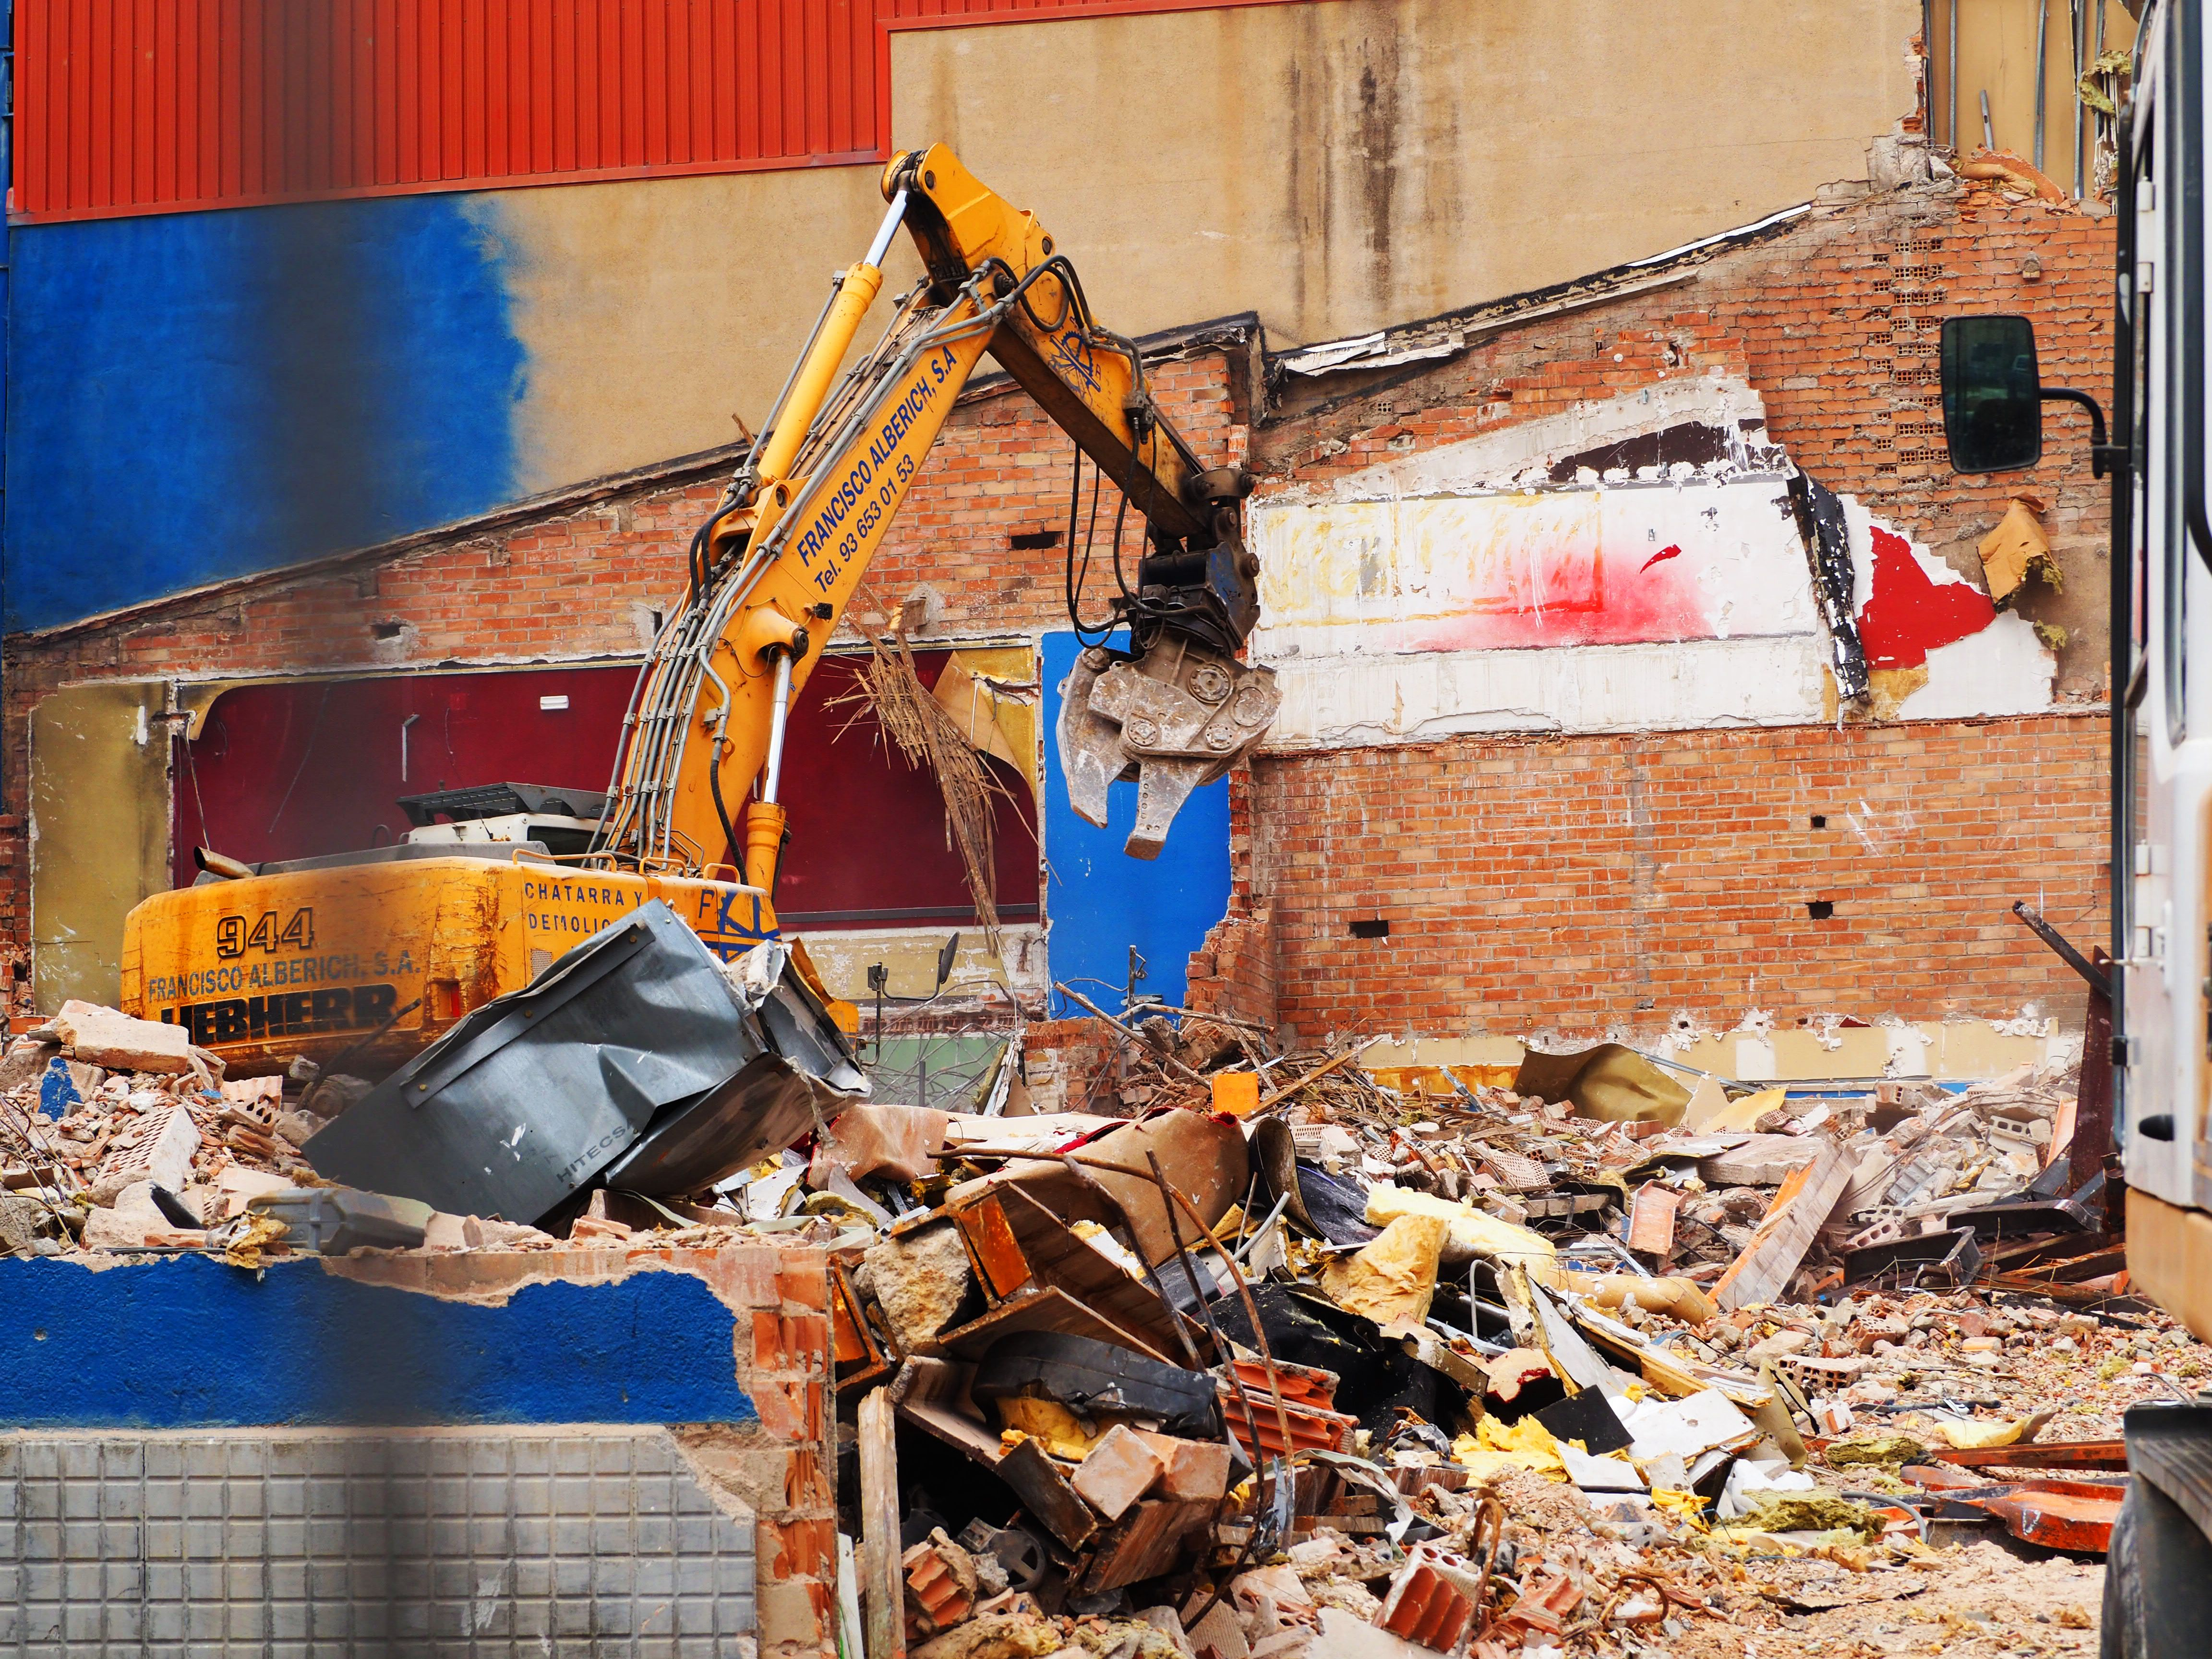 Enderrocament dels cinemes El Punt. FOTO: Mónica García Moreno